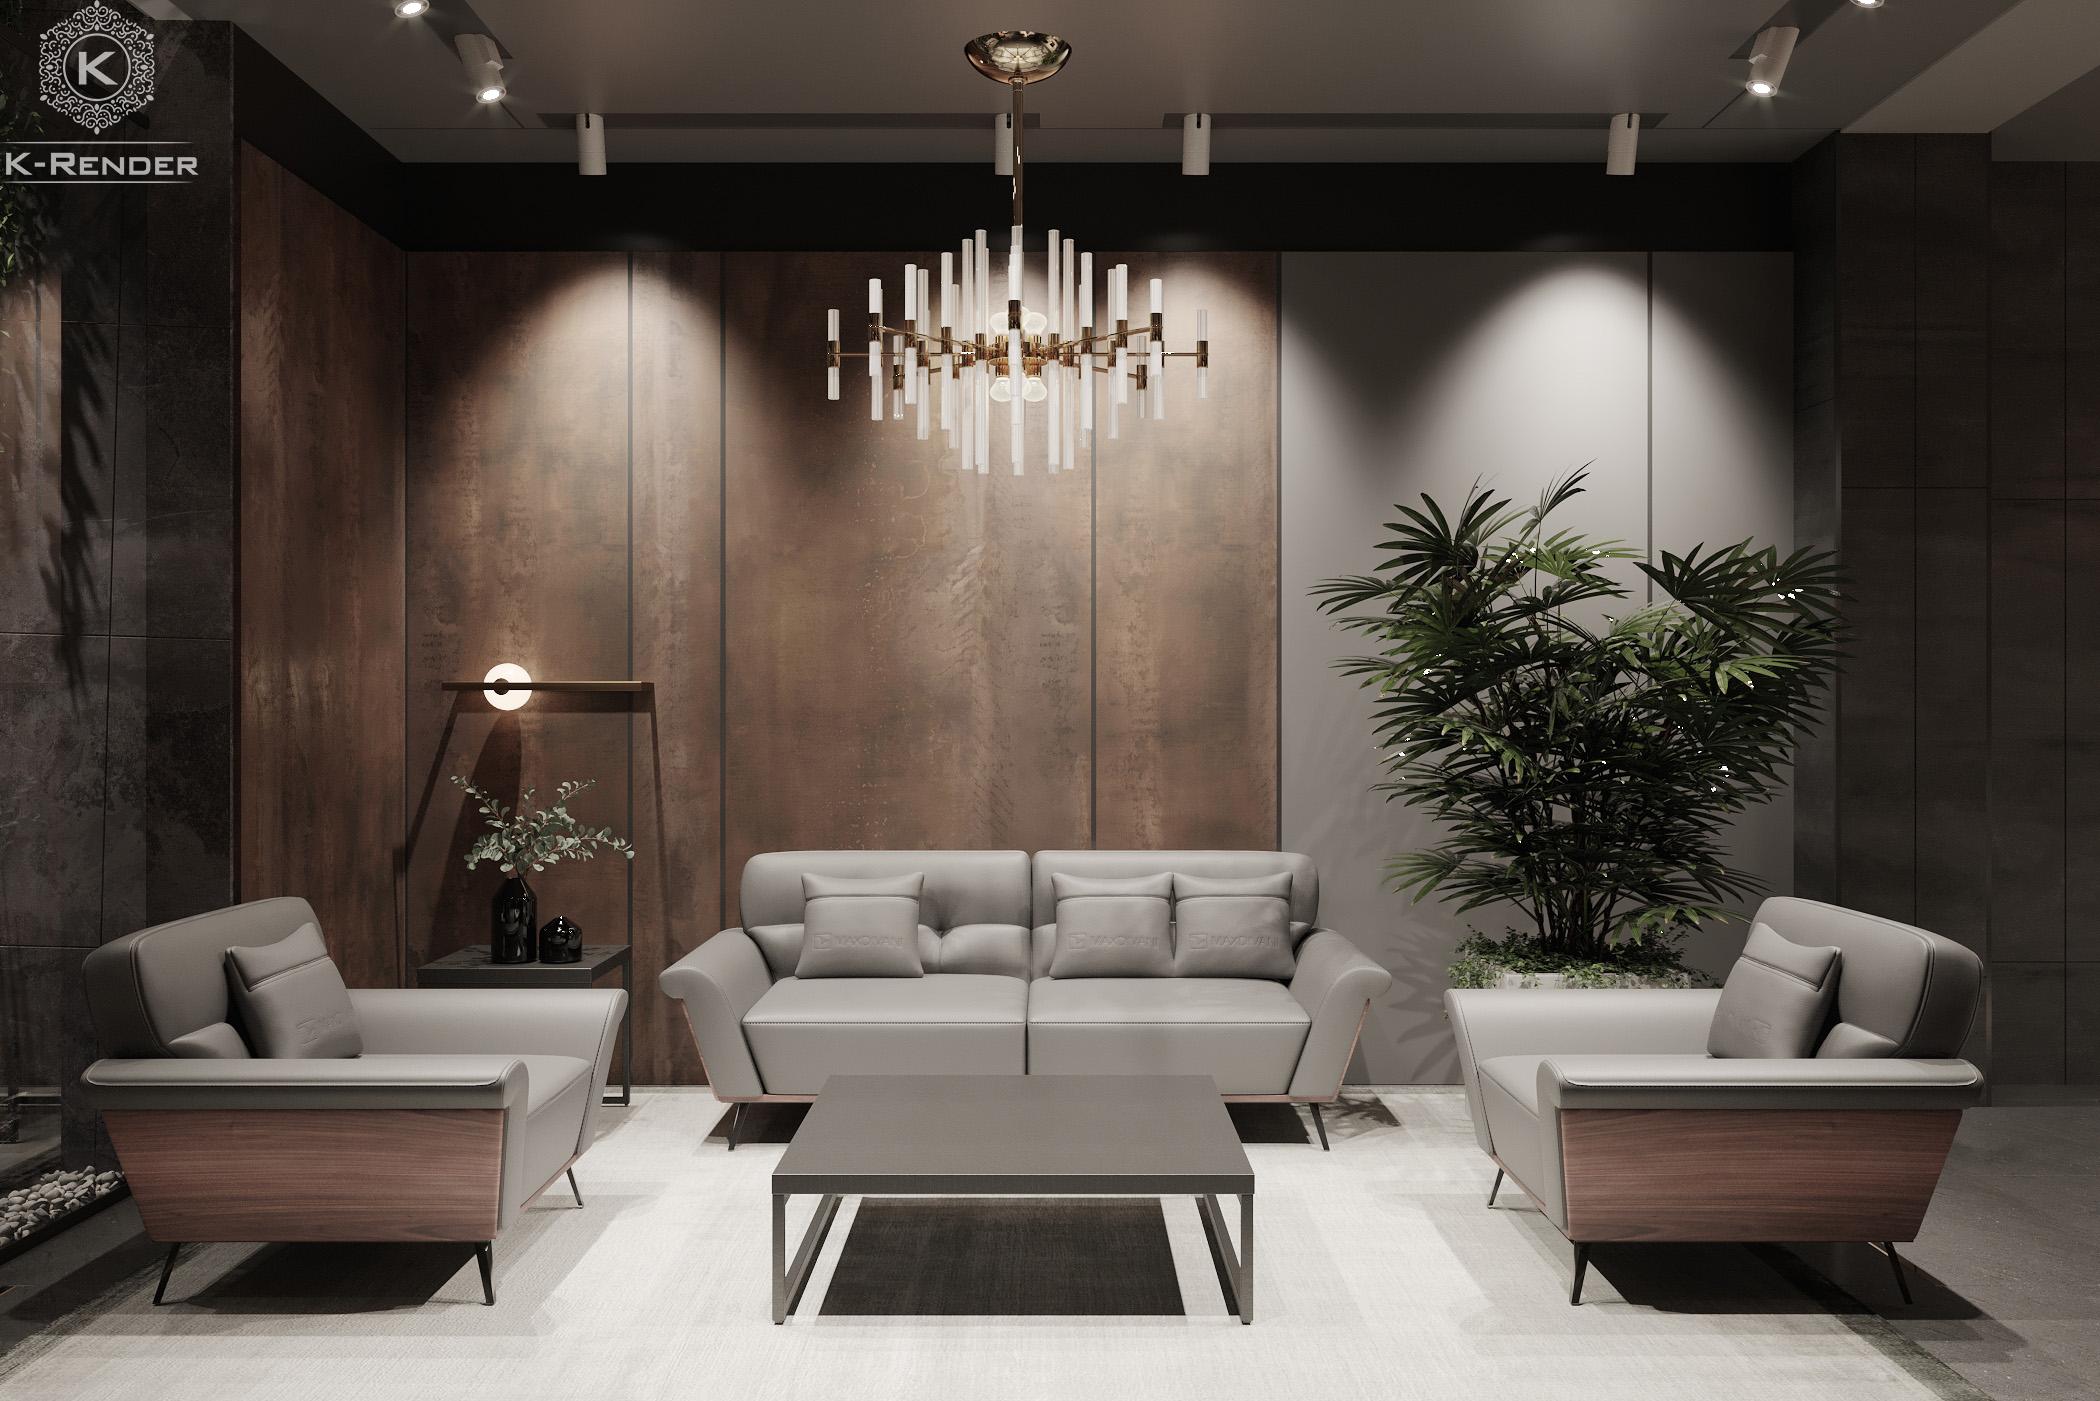 the-arture-home-project-k-render-studio